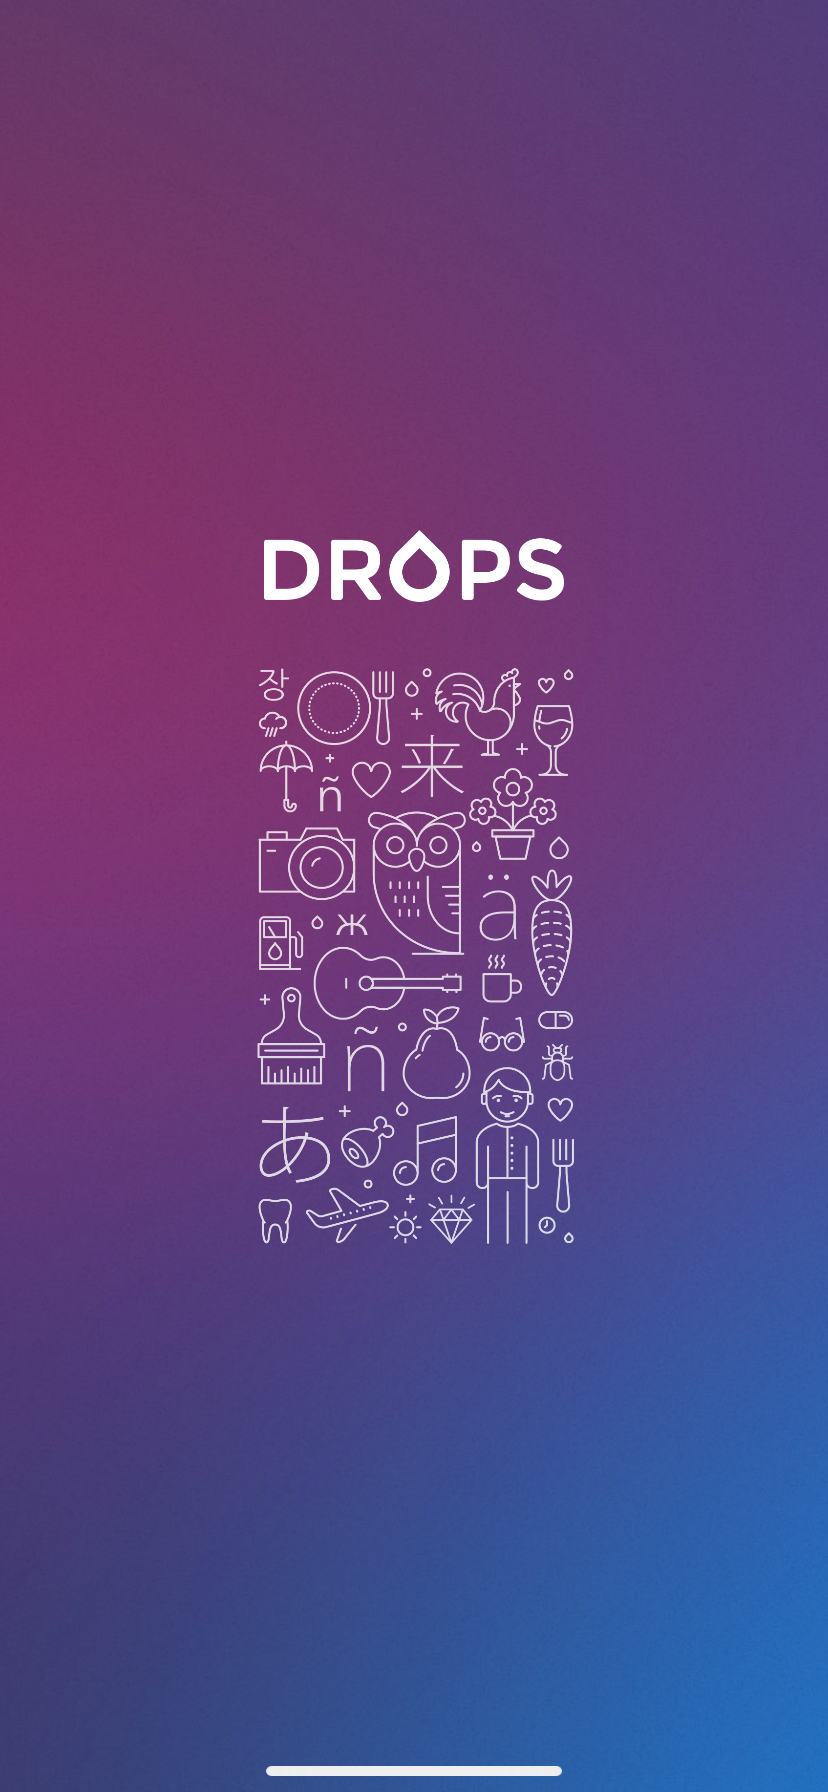 drops language learning app ux screenshot 1